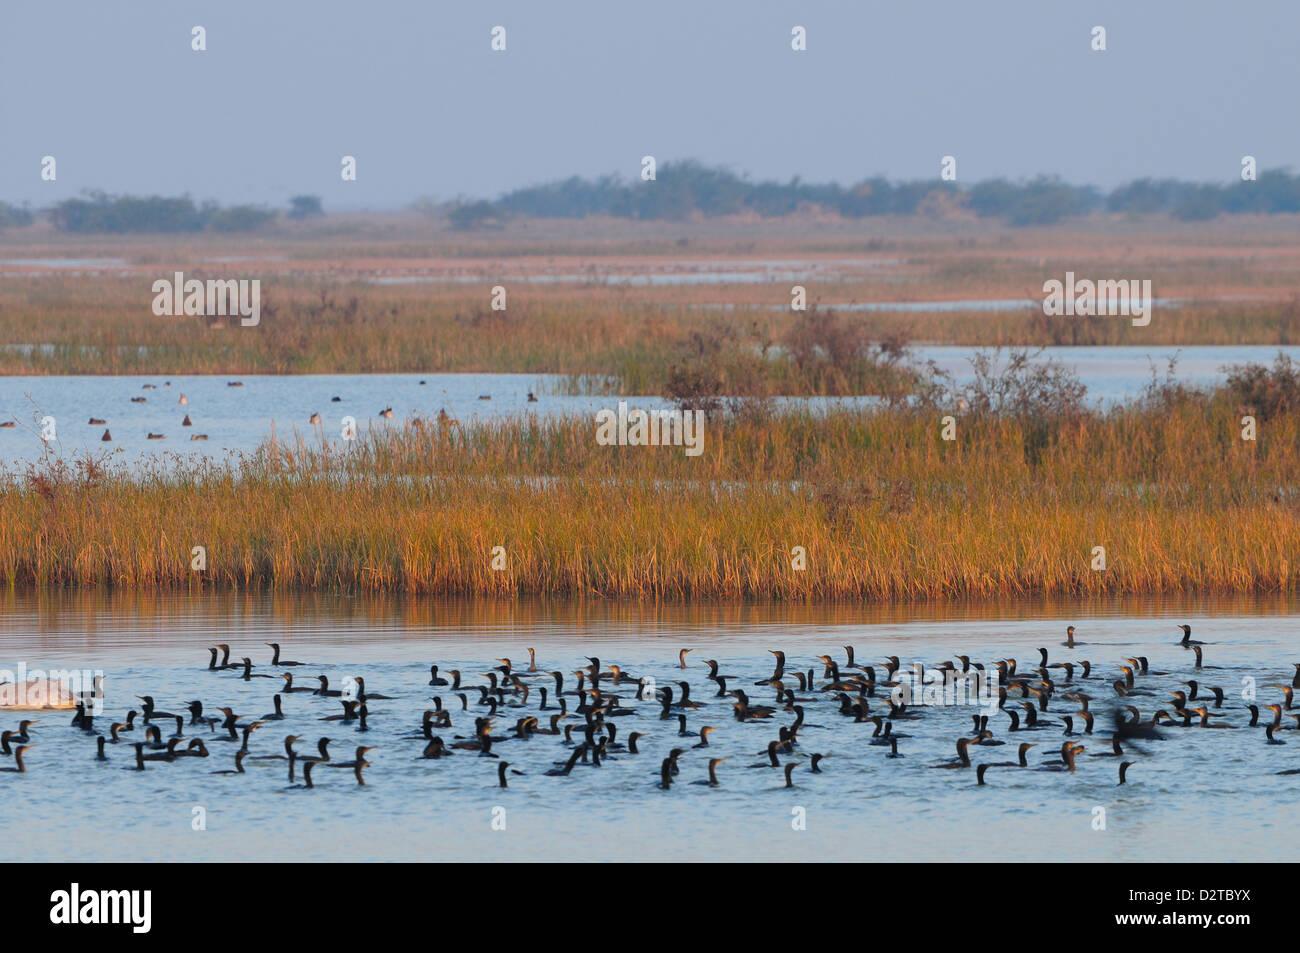 Cormorants on the lake in rural India, Gujarat, India, Asia - Stock Image